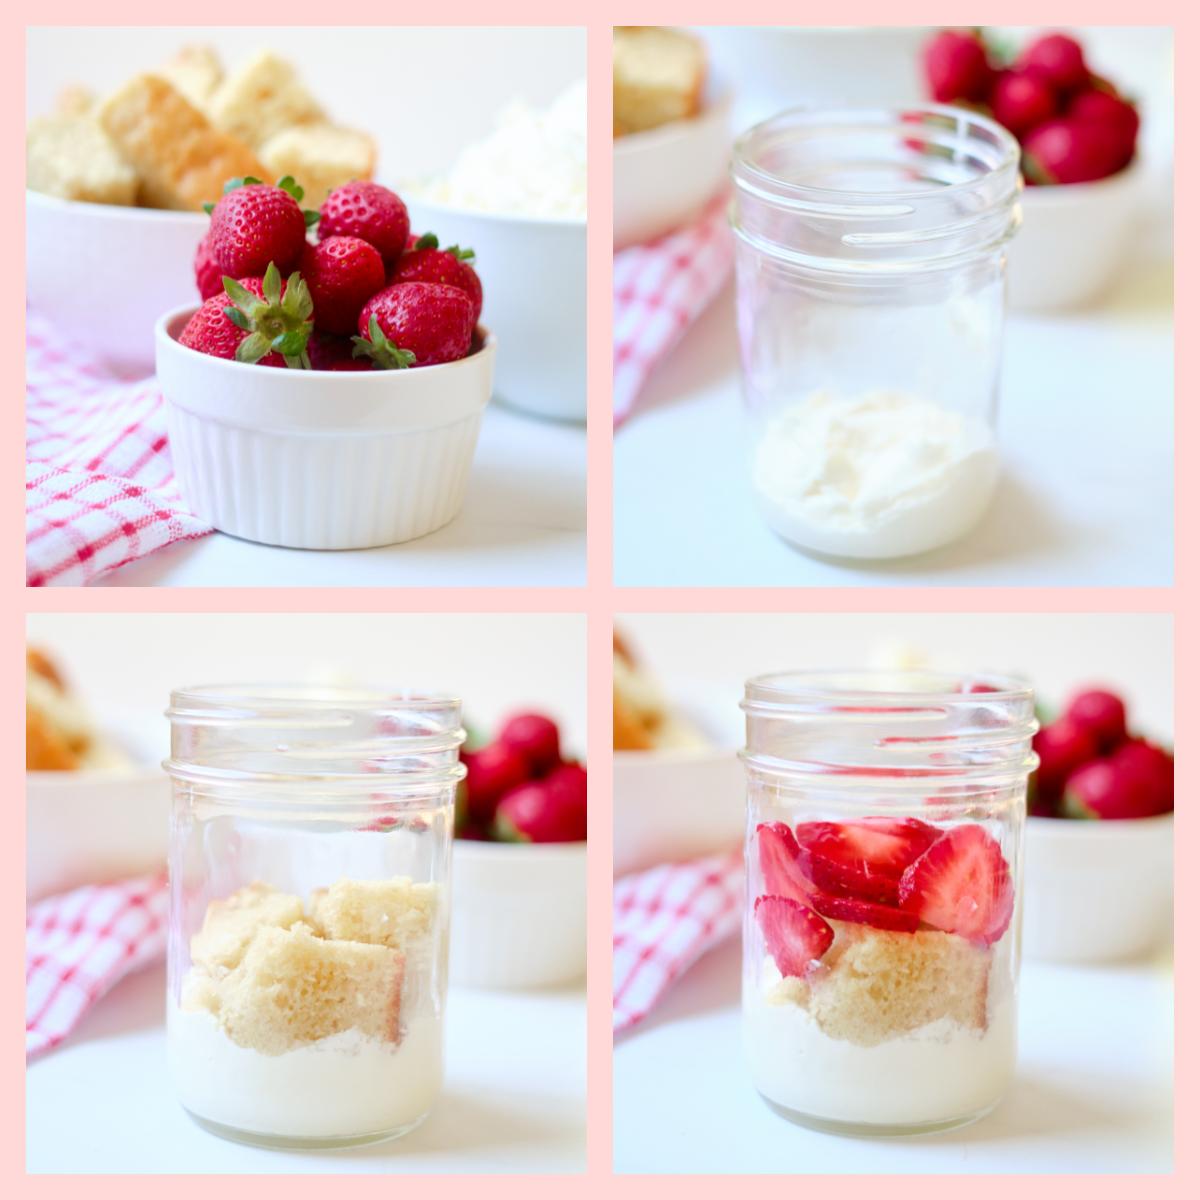 strawberry shortcake in a jar ingredients, mason jar and layering steps